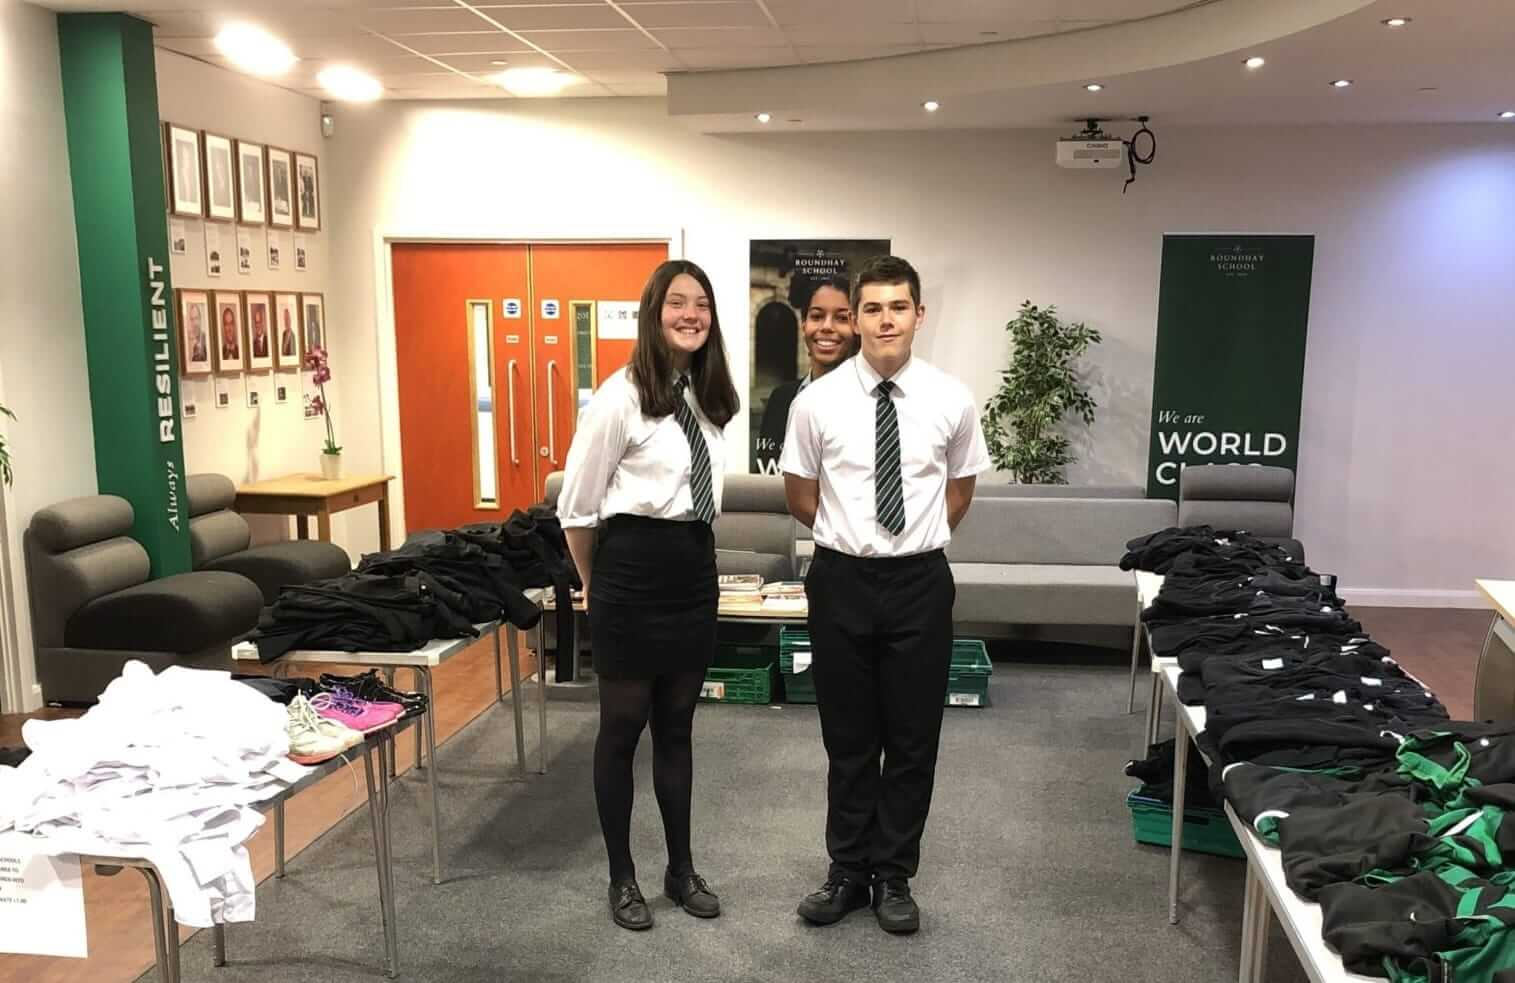 Morley Glass backs Roundhay School volunteers' green ambitions